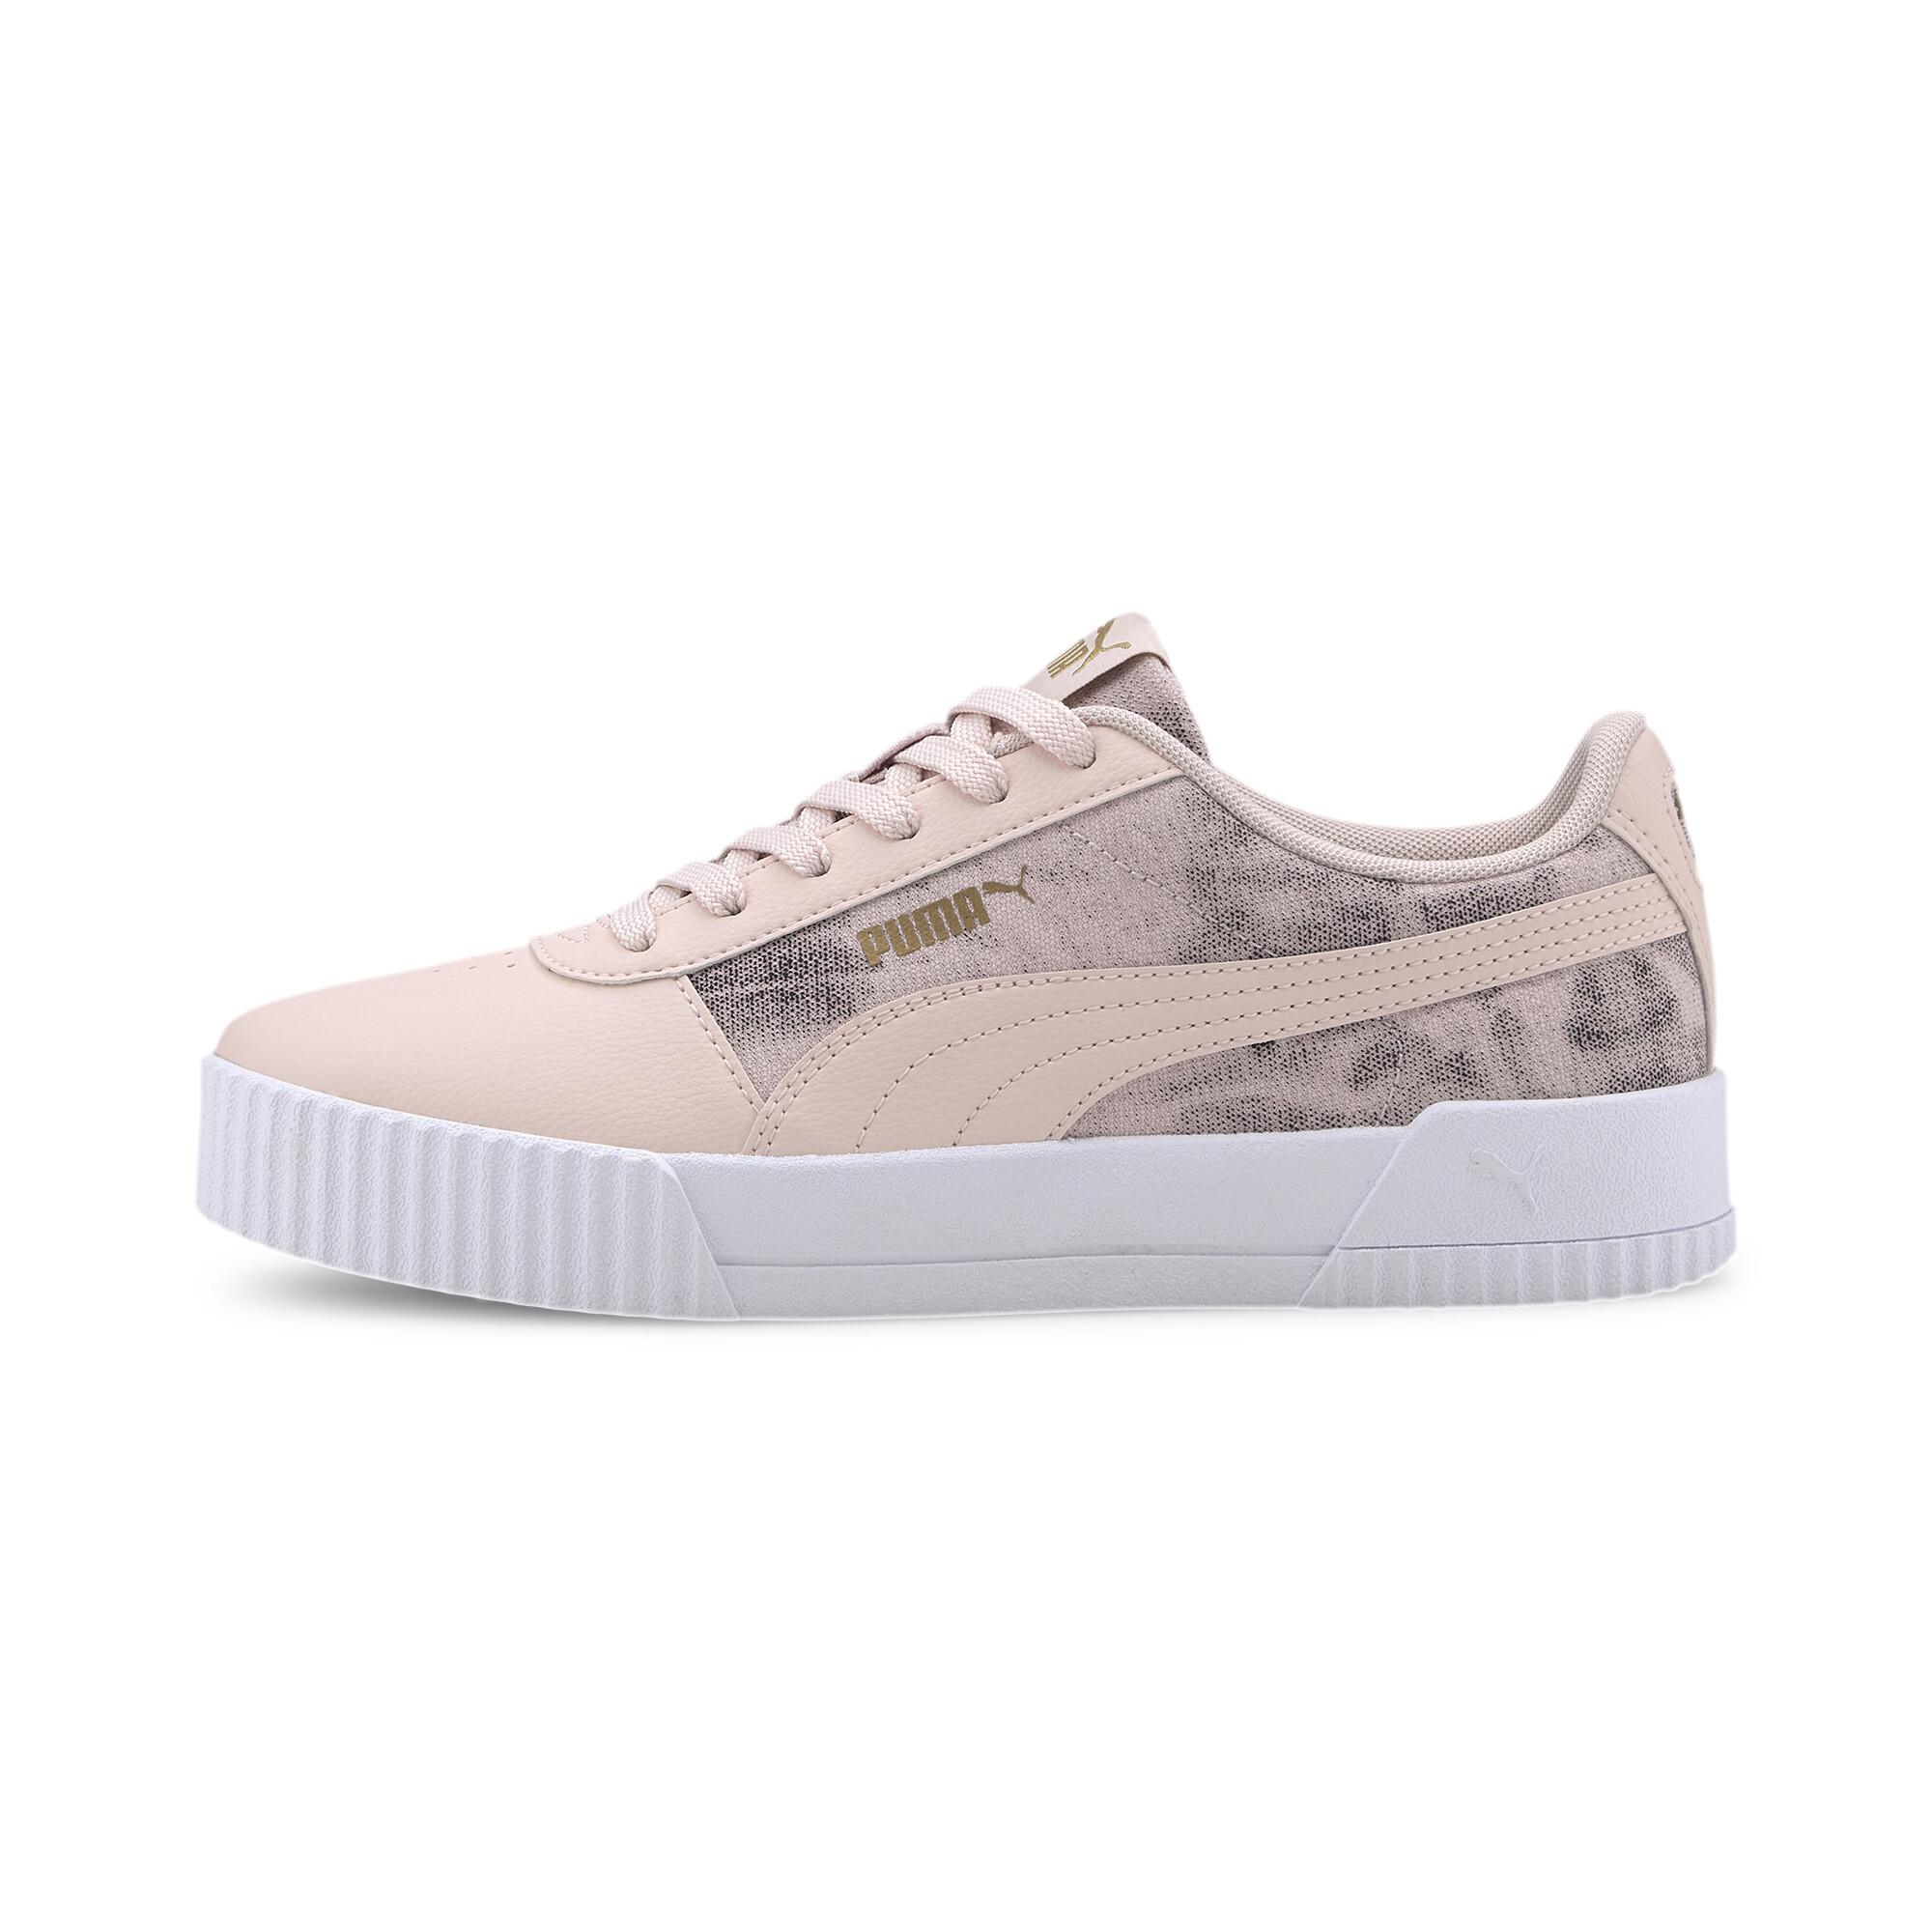 PUMA-Women-039-s-Carina-Tie-Dye-Sneakers thumbnail 4